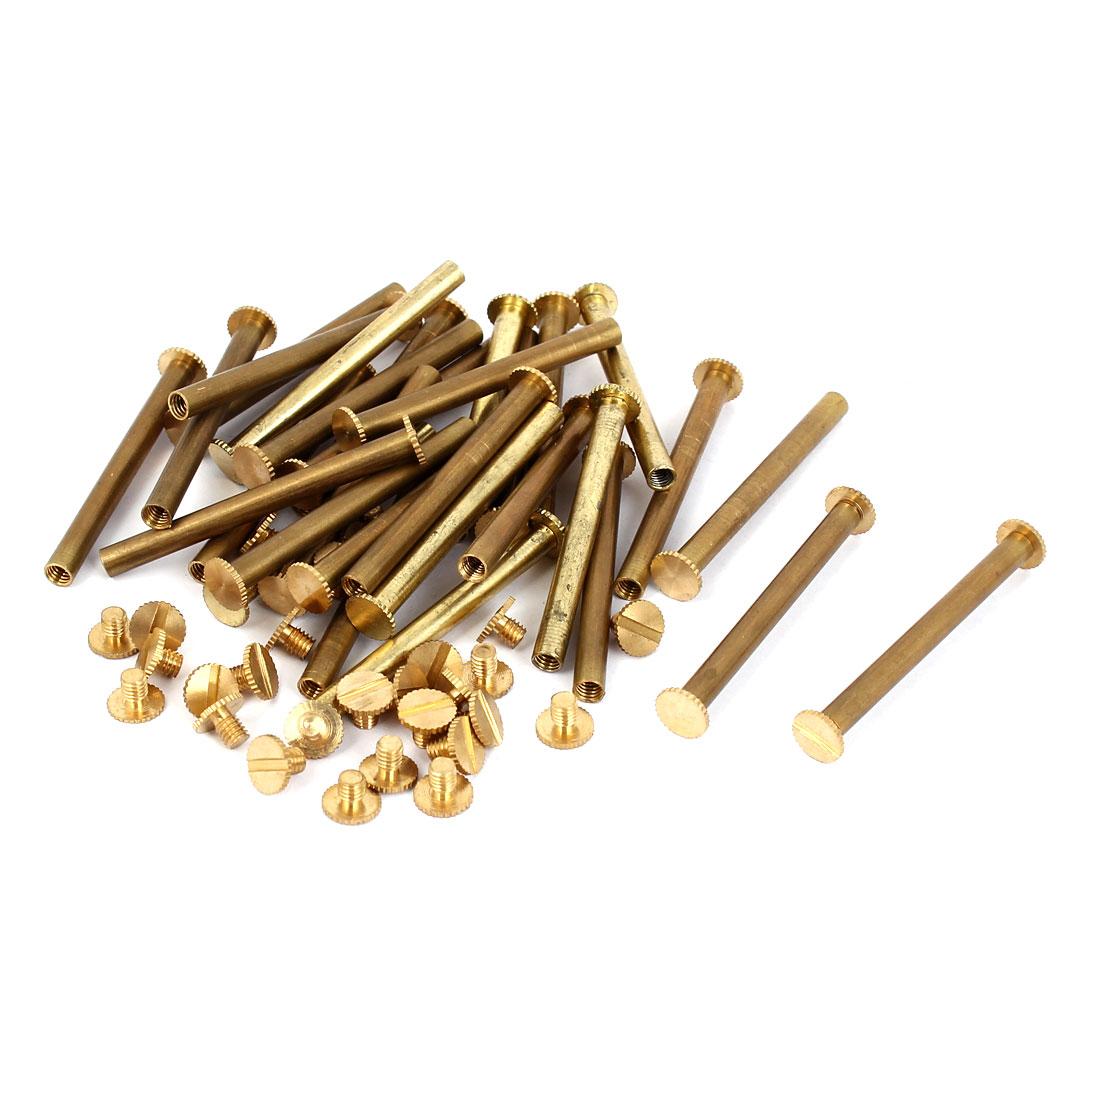 Purse Belts Scrapbooks Brass Knurled Binding Chicago Screws M5 x 50mm 30 Pcs